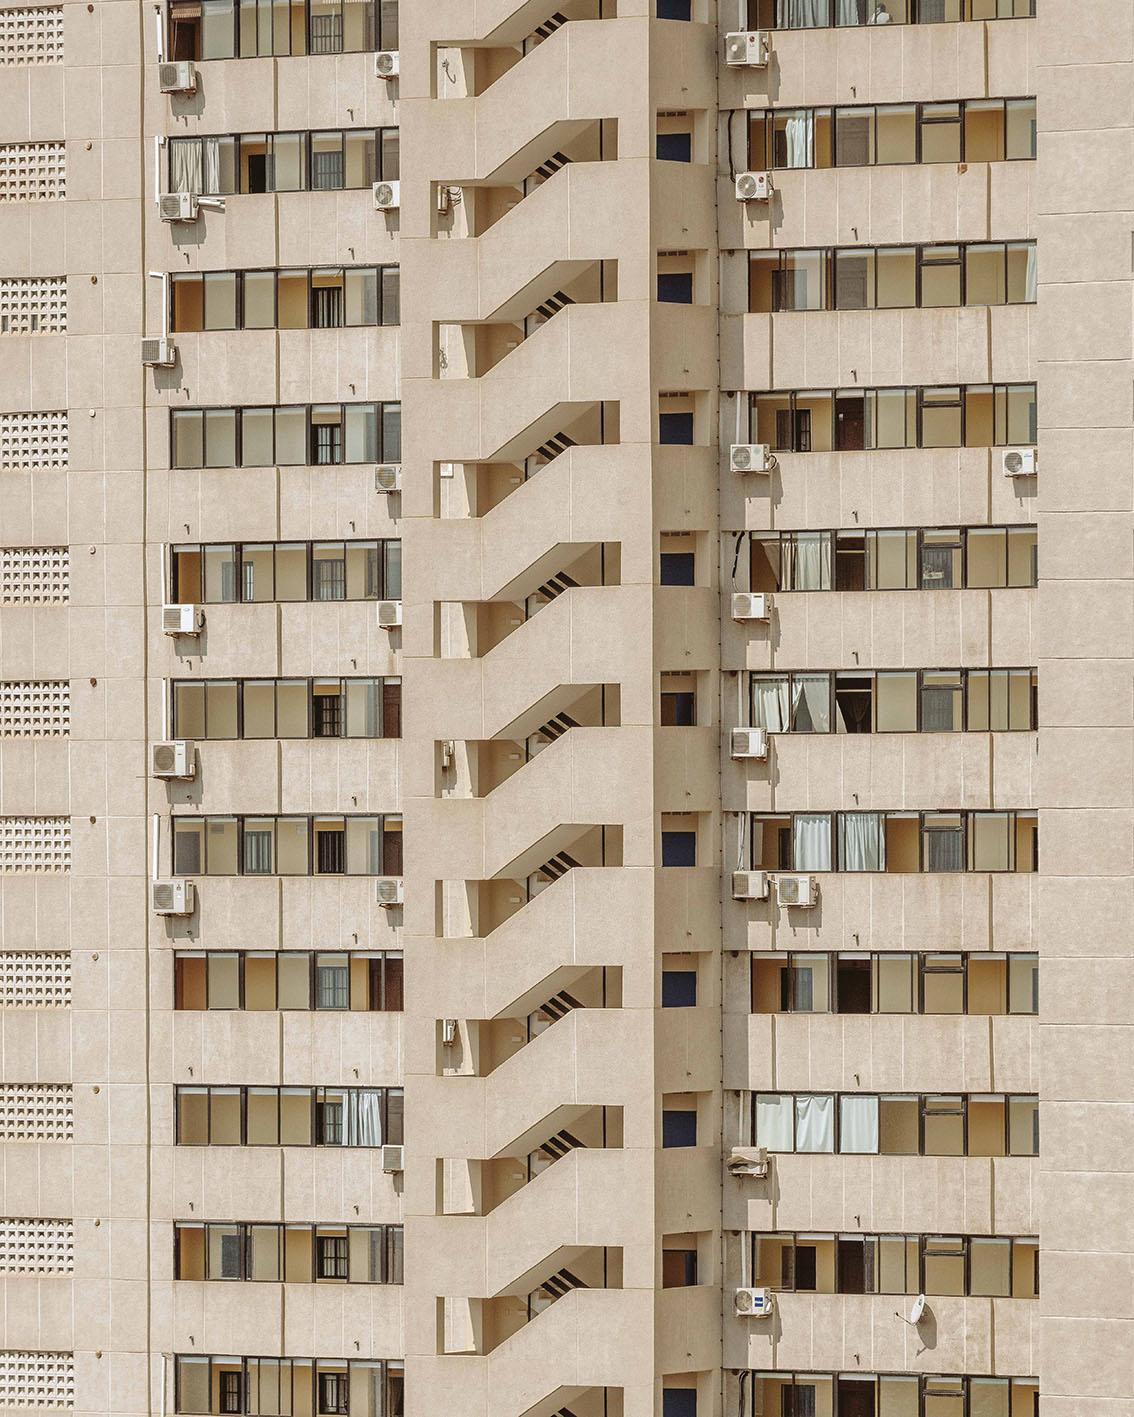 yosigo_arquitectura2.jpg